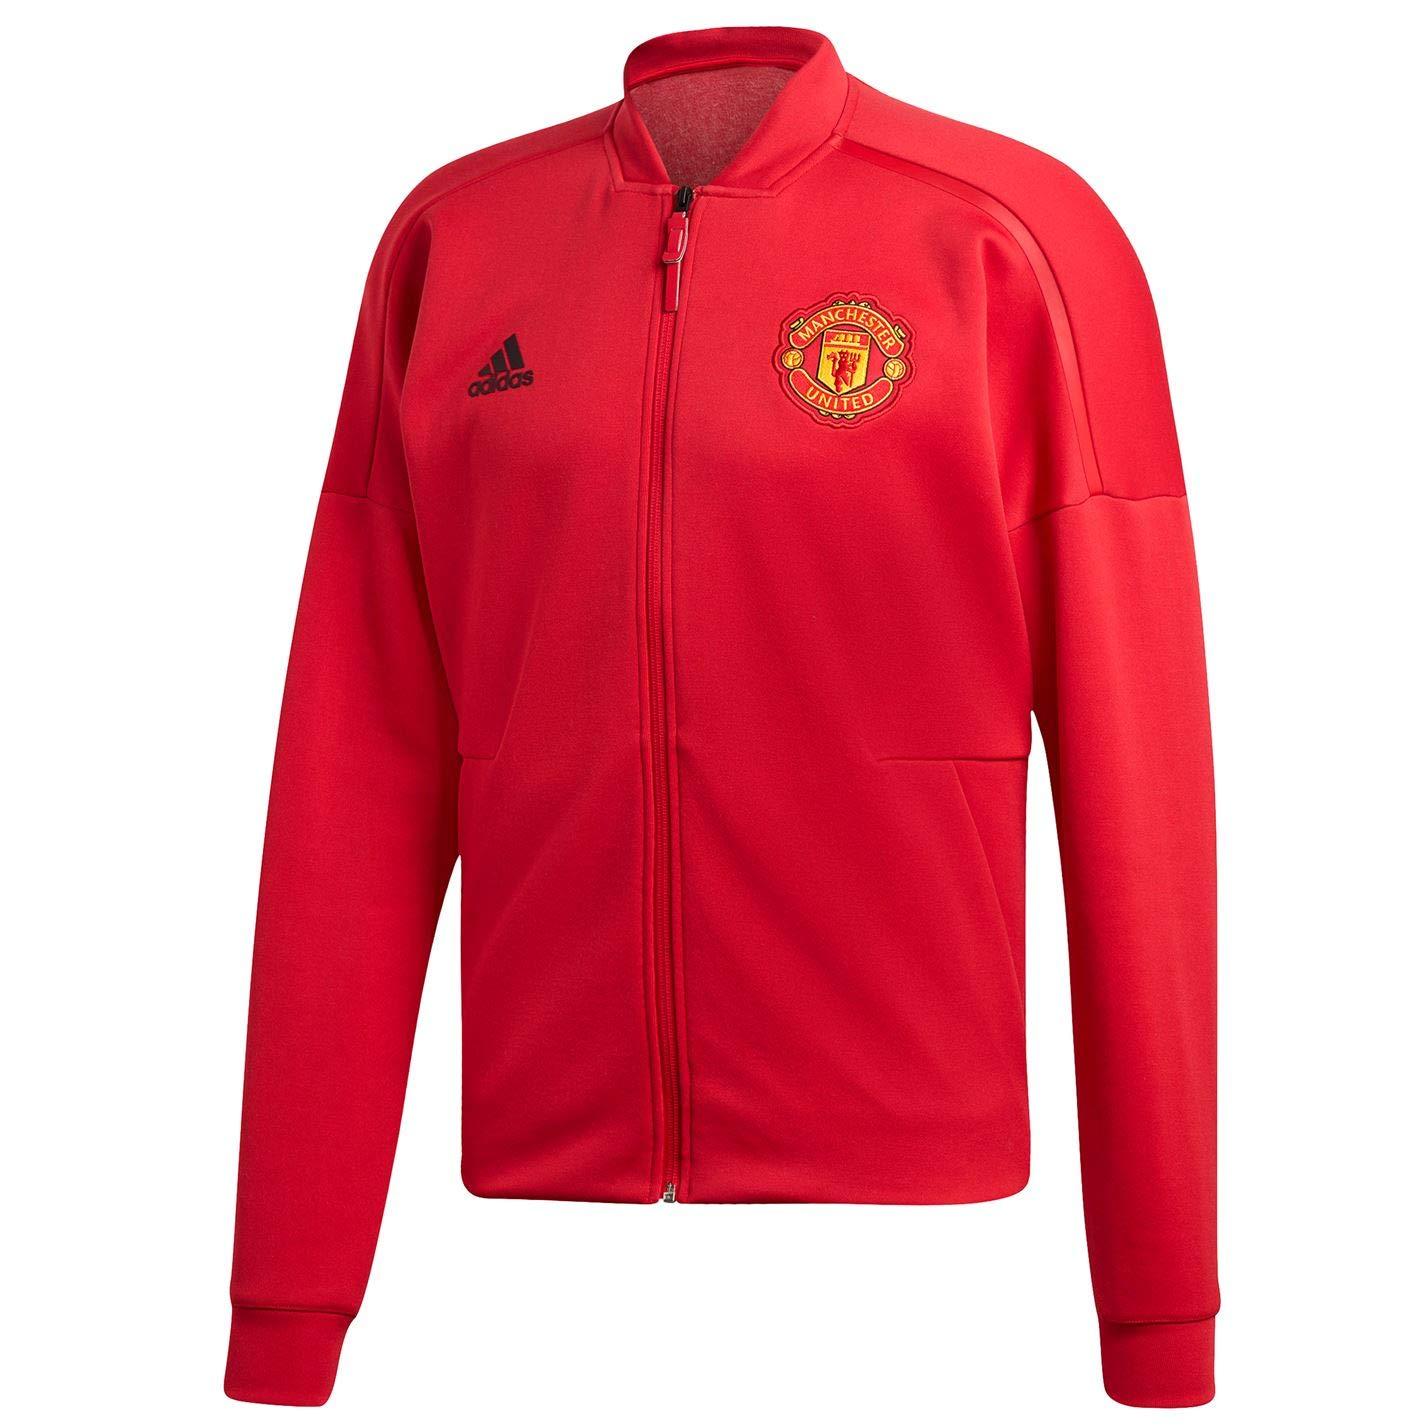 Adidas Herren Manchester United Z.n.e. Hoodie Jacket Jacke